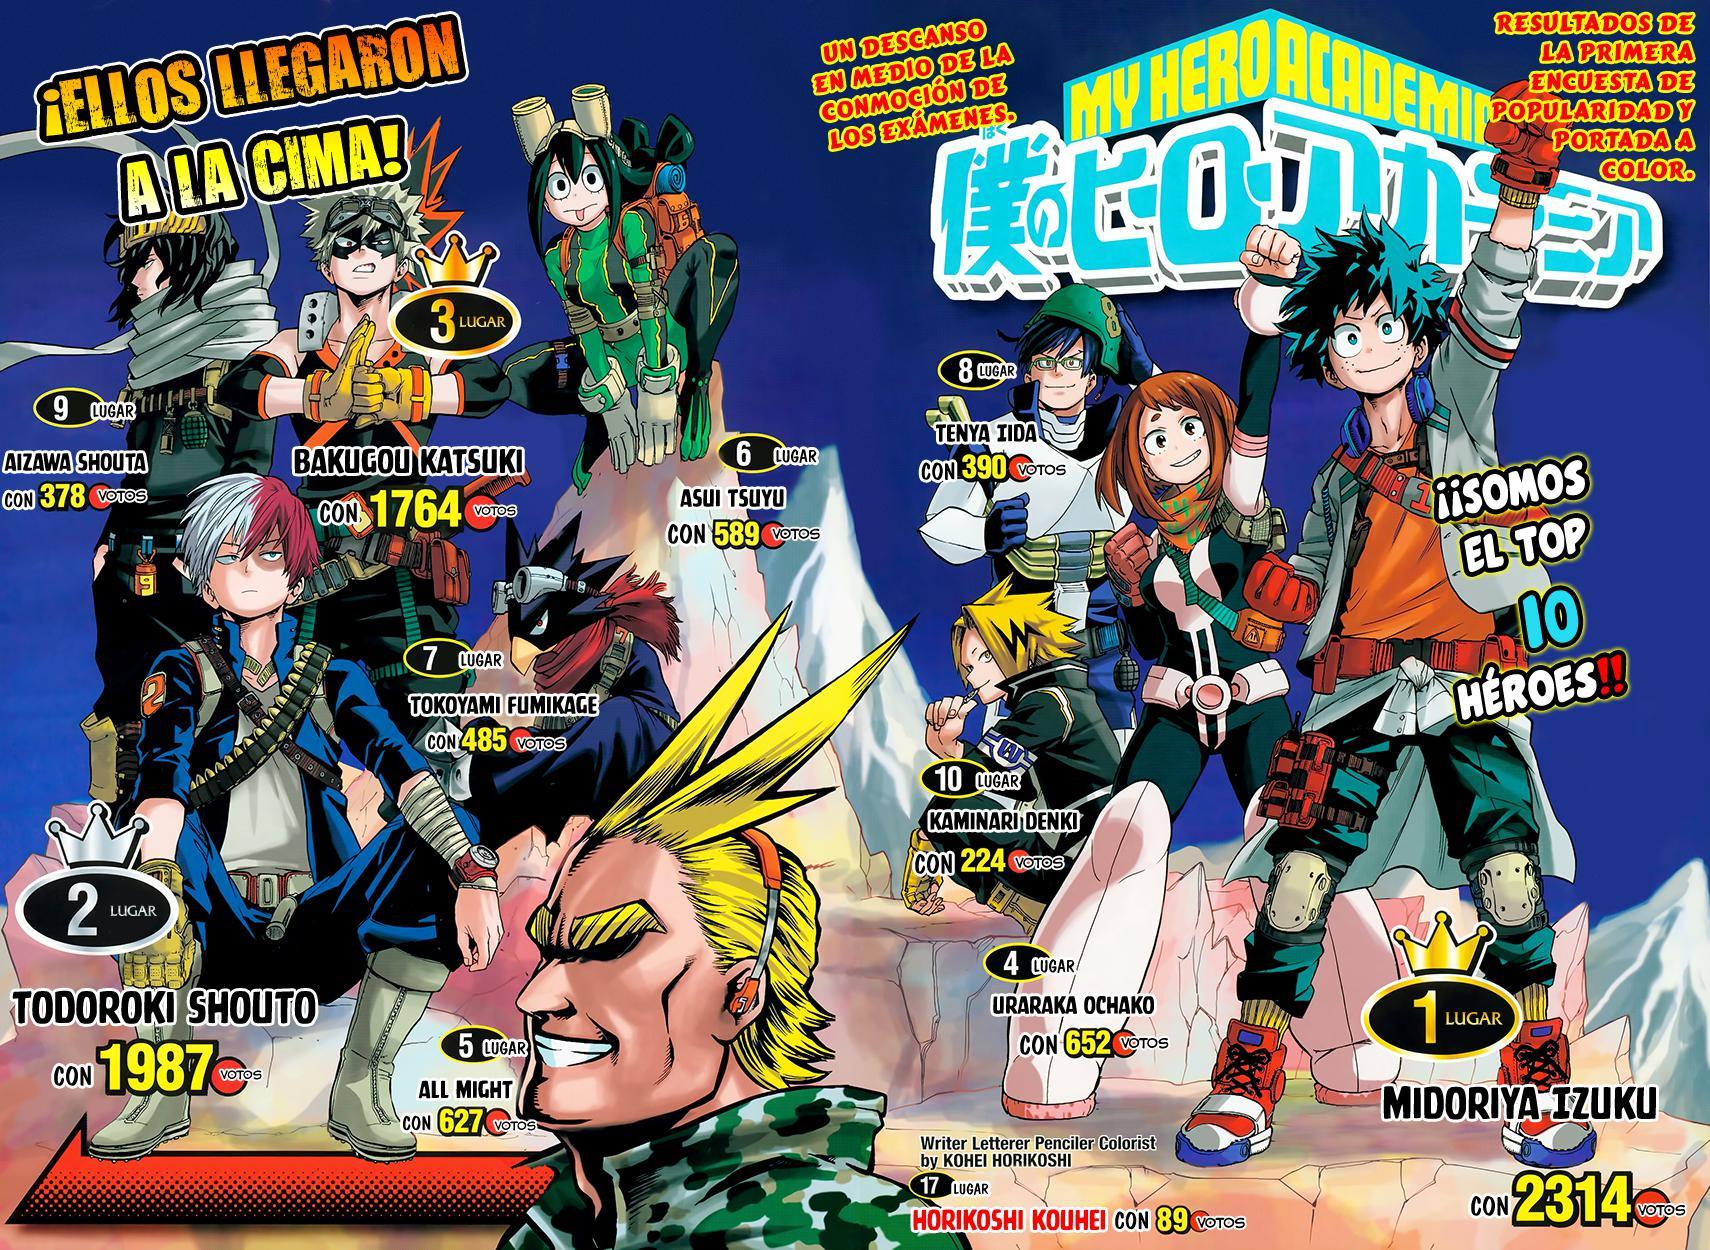 http://c5.ninemanga.com/es_manga/54/182/419462/d3ed9e3df6007d59a203f7b692880796.jpg Page 4